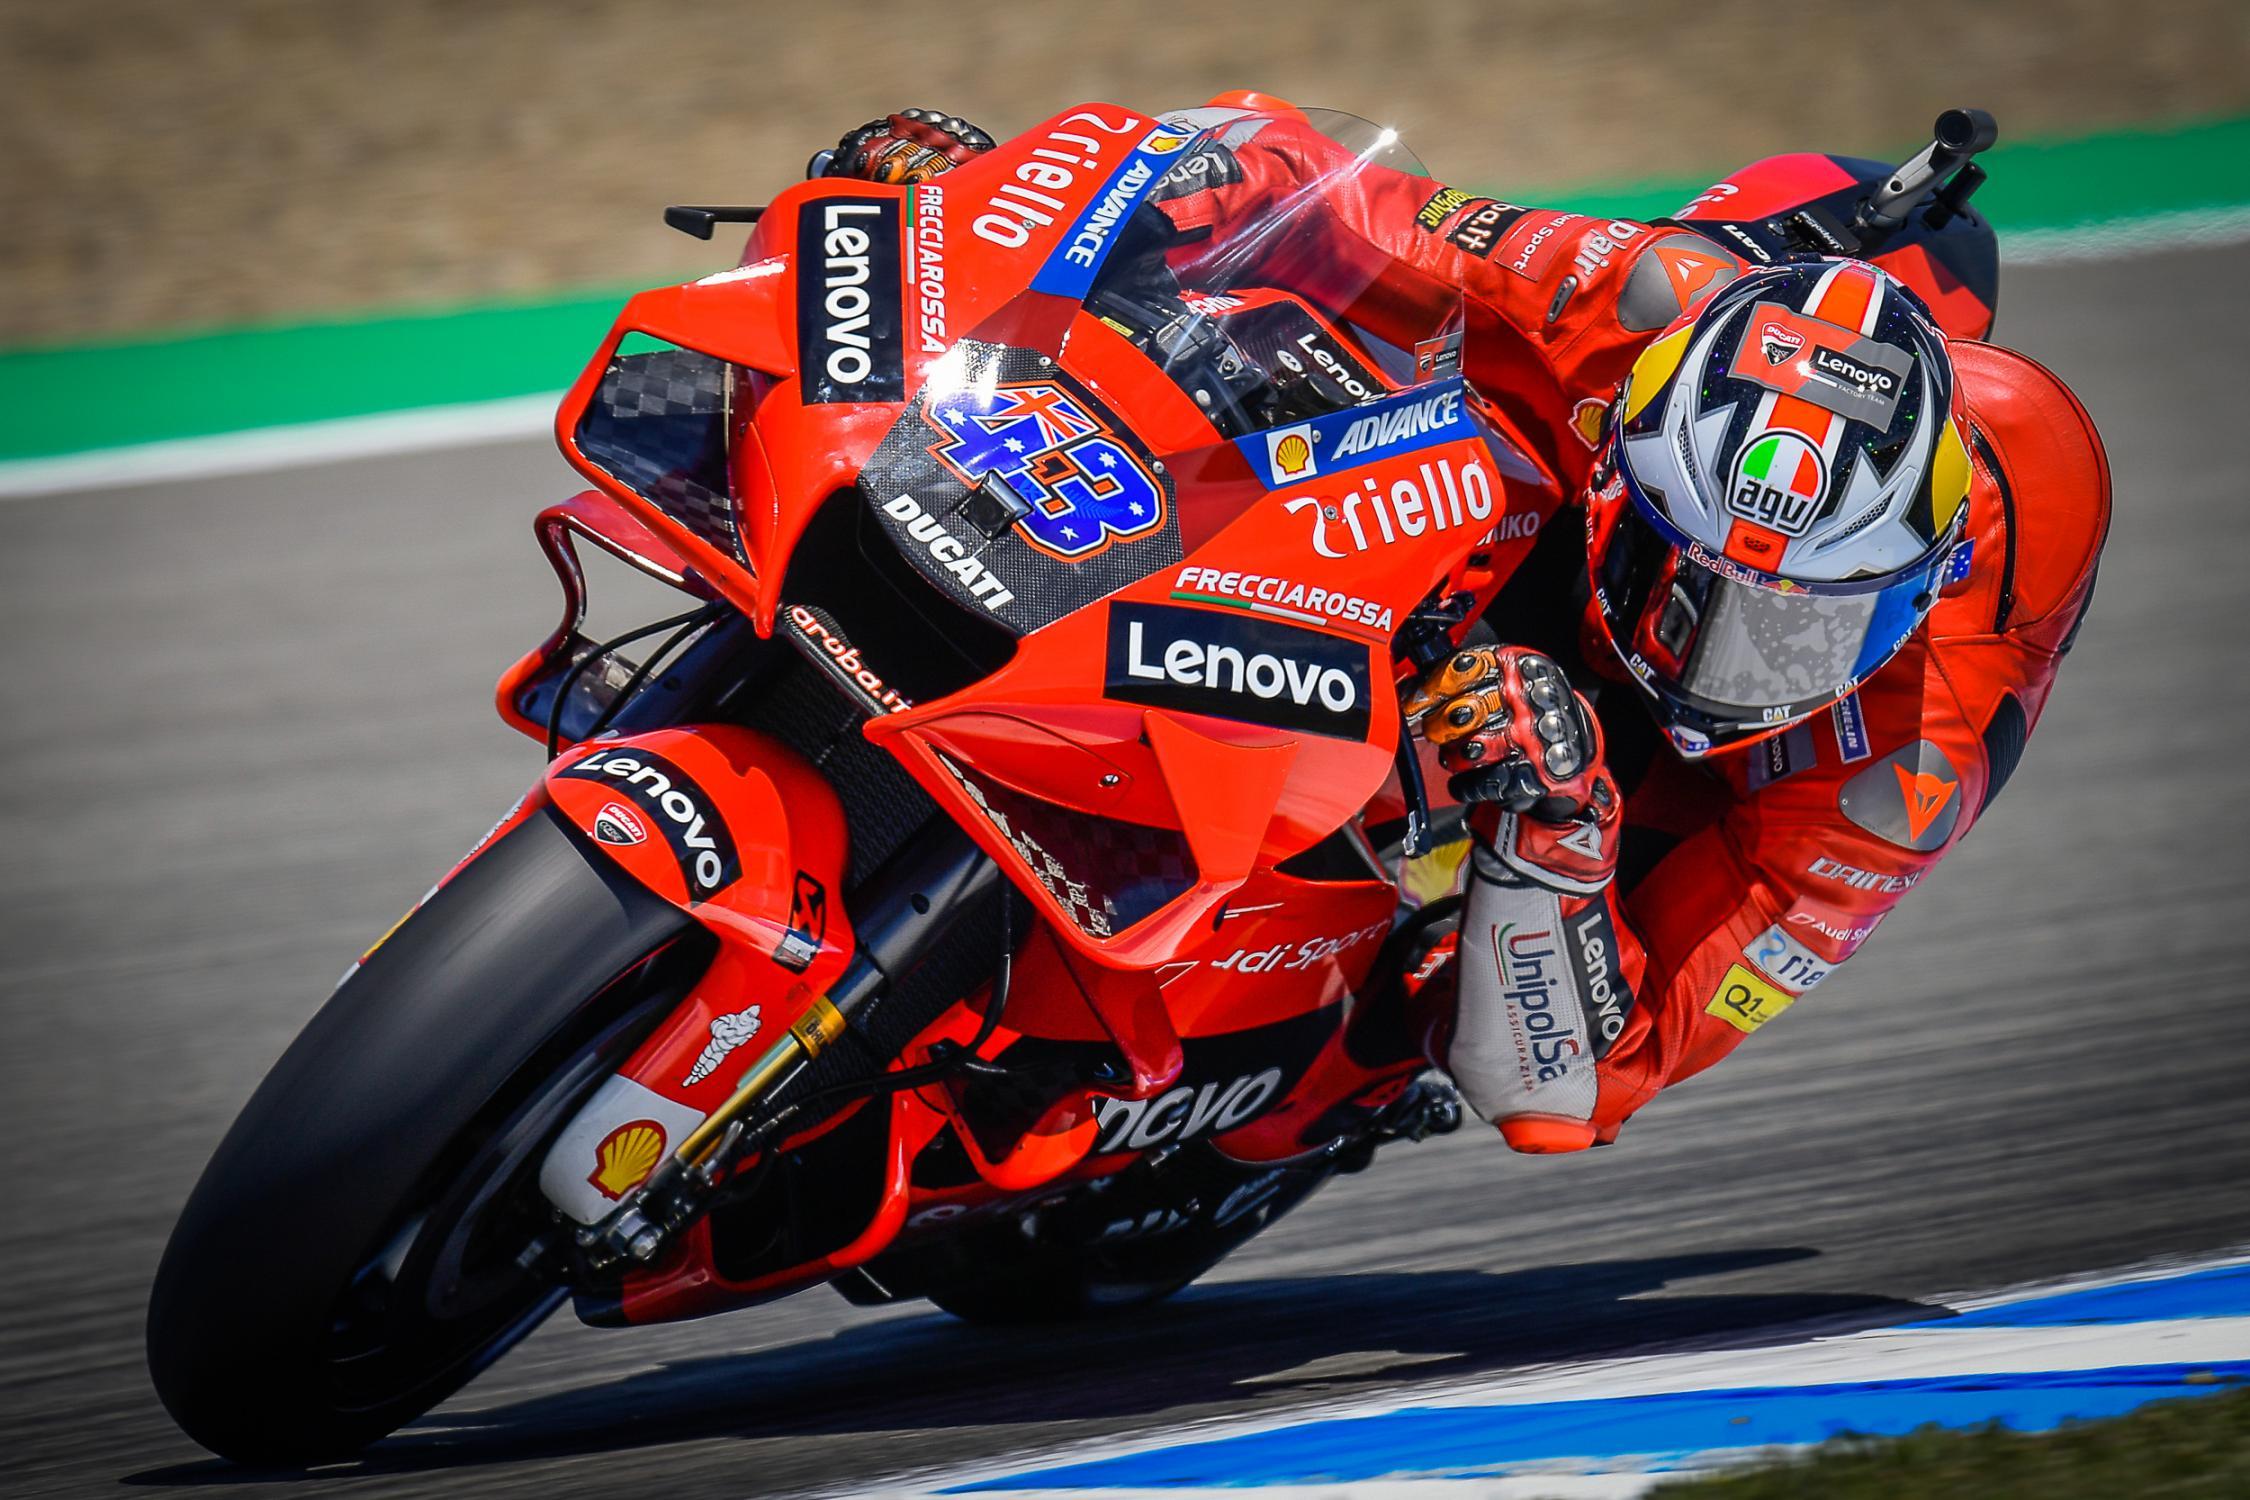 MOTO GP GRAND PRIX D'ESPAGNE 2021 - Page 2 Jack-miller-jerez-motogp-2021